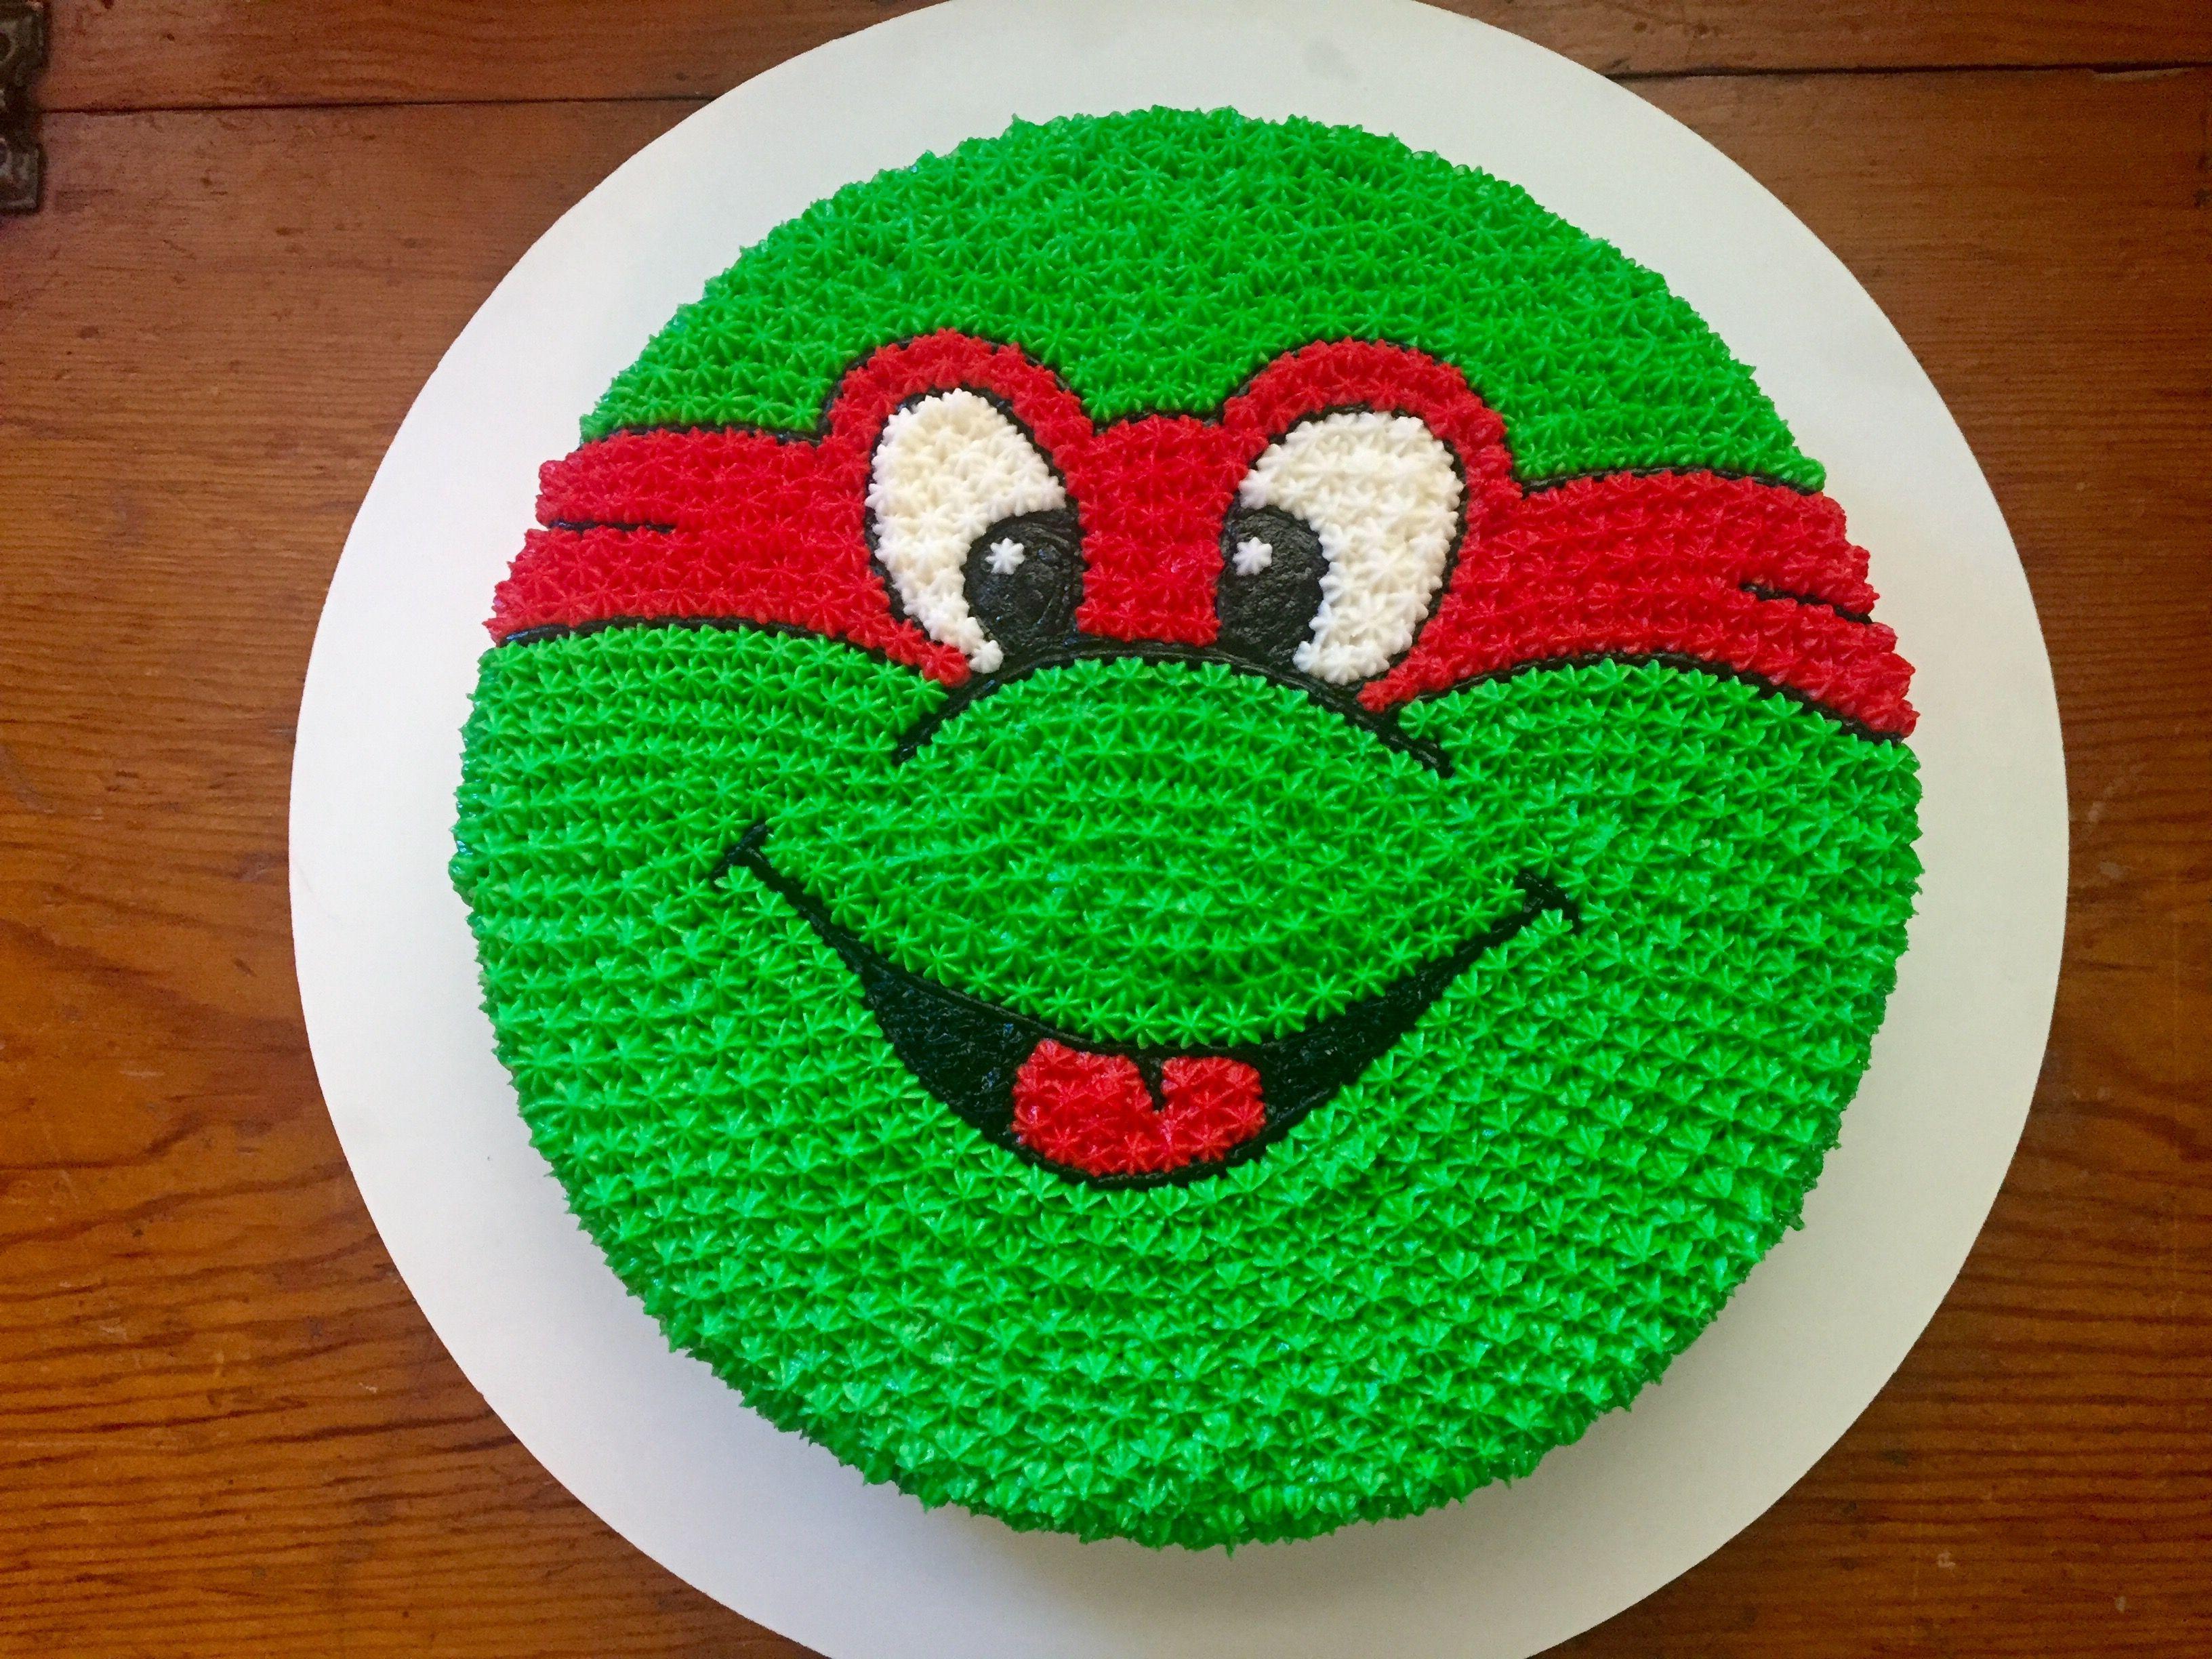 Teenage Mutant Ninja Turtles Buttercream Birthday Cake Red Green J P Bakes Ninja Turtle Cake Buttercream Birthday Cake Cake